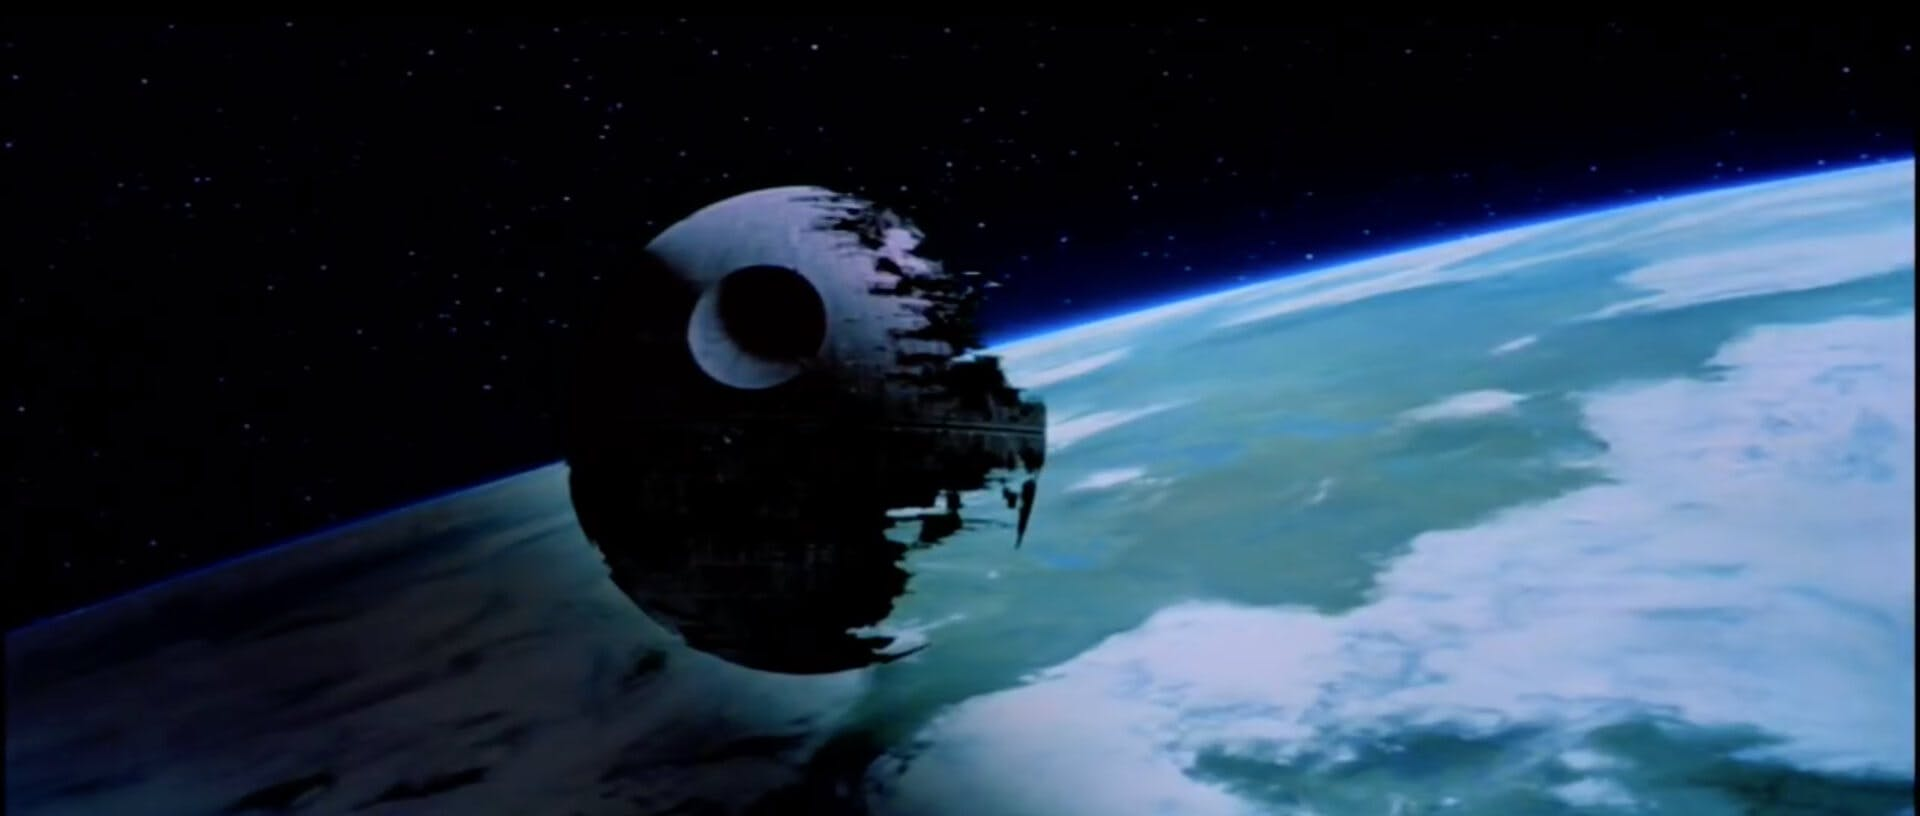 Return of the Jedi - Death Star